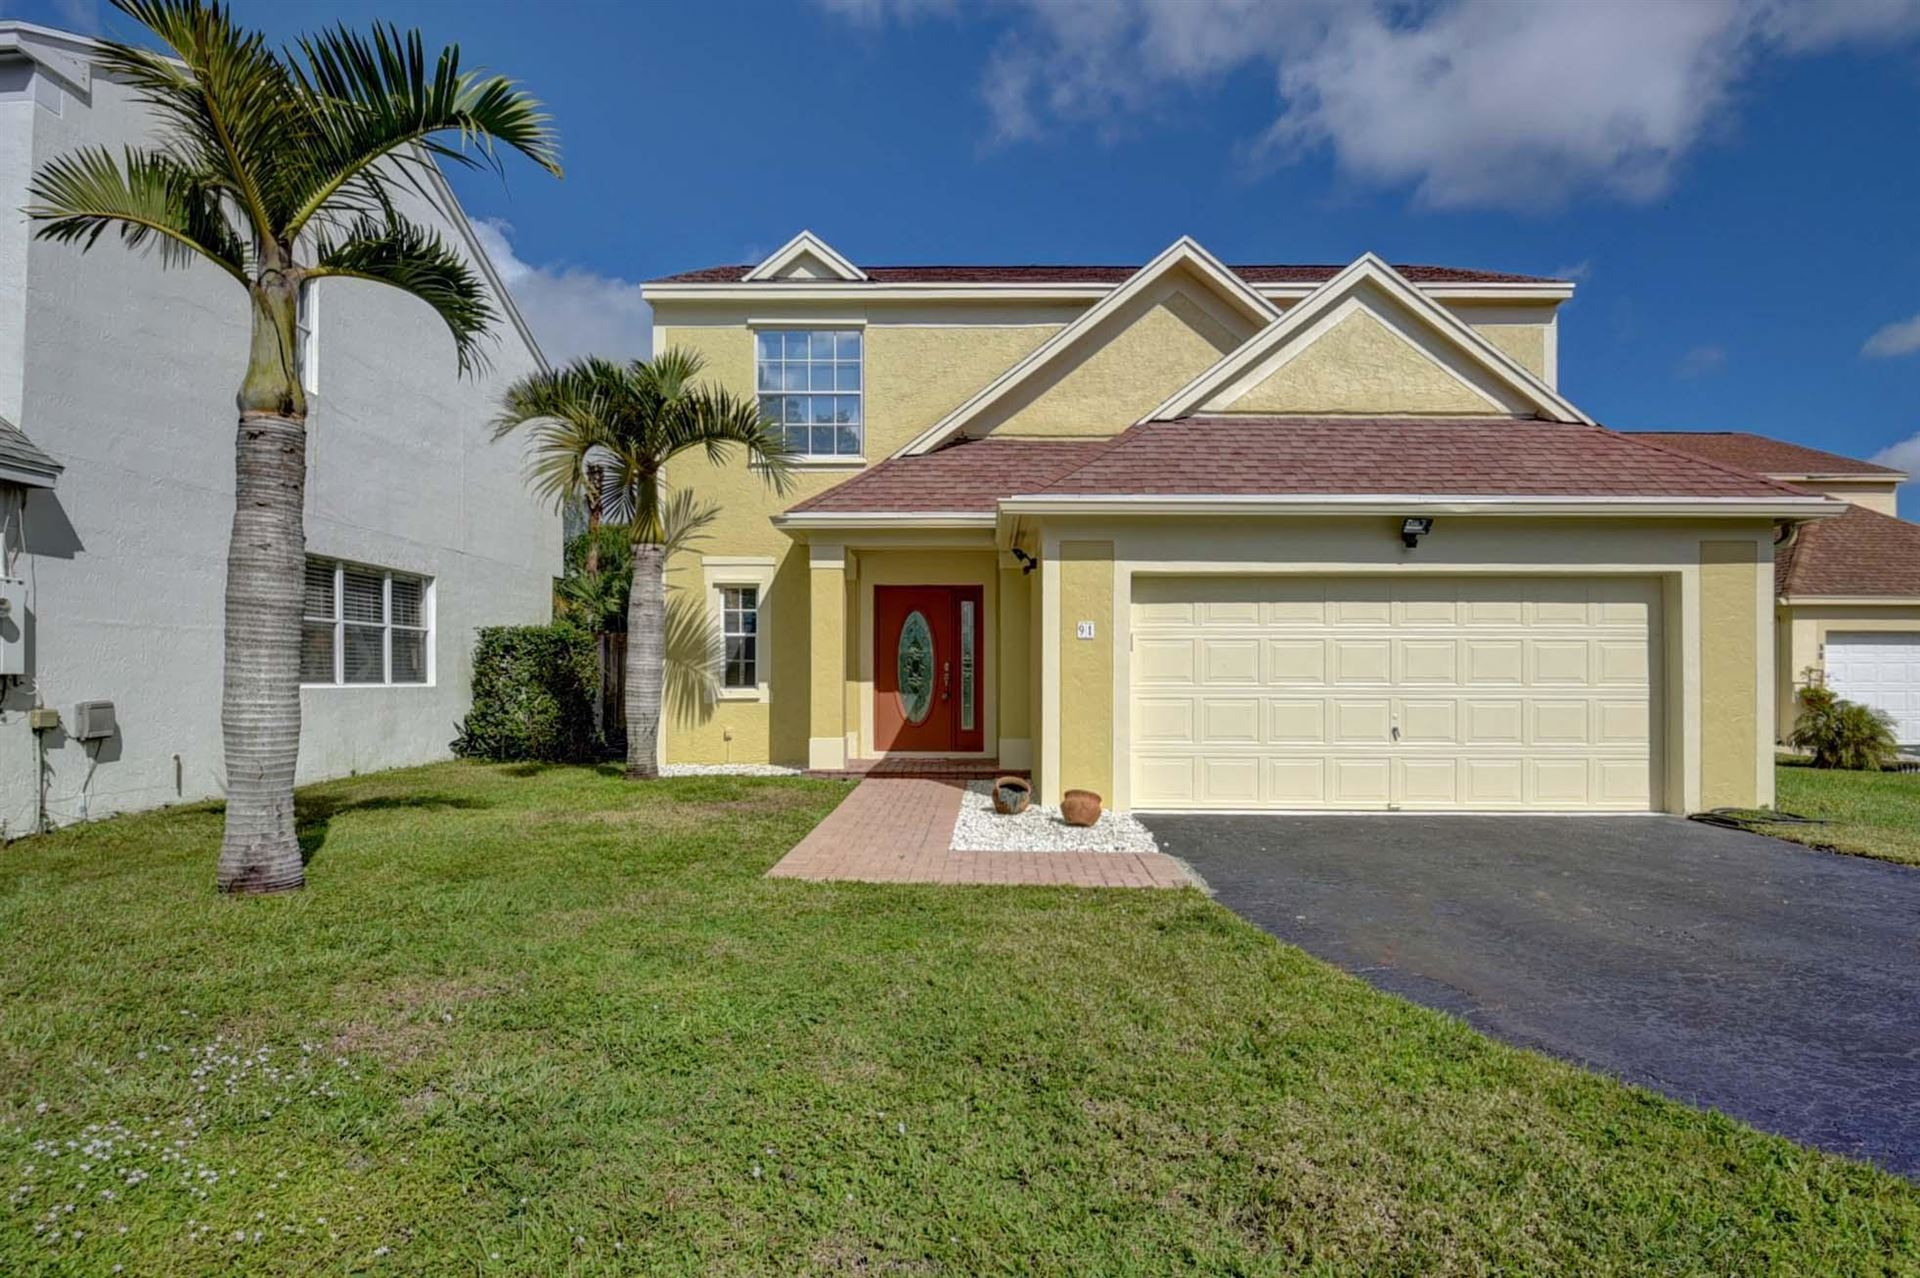 91 Swallow Drive, Boynton Beach, FL 33436 - #: RX-10667408